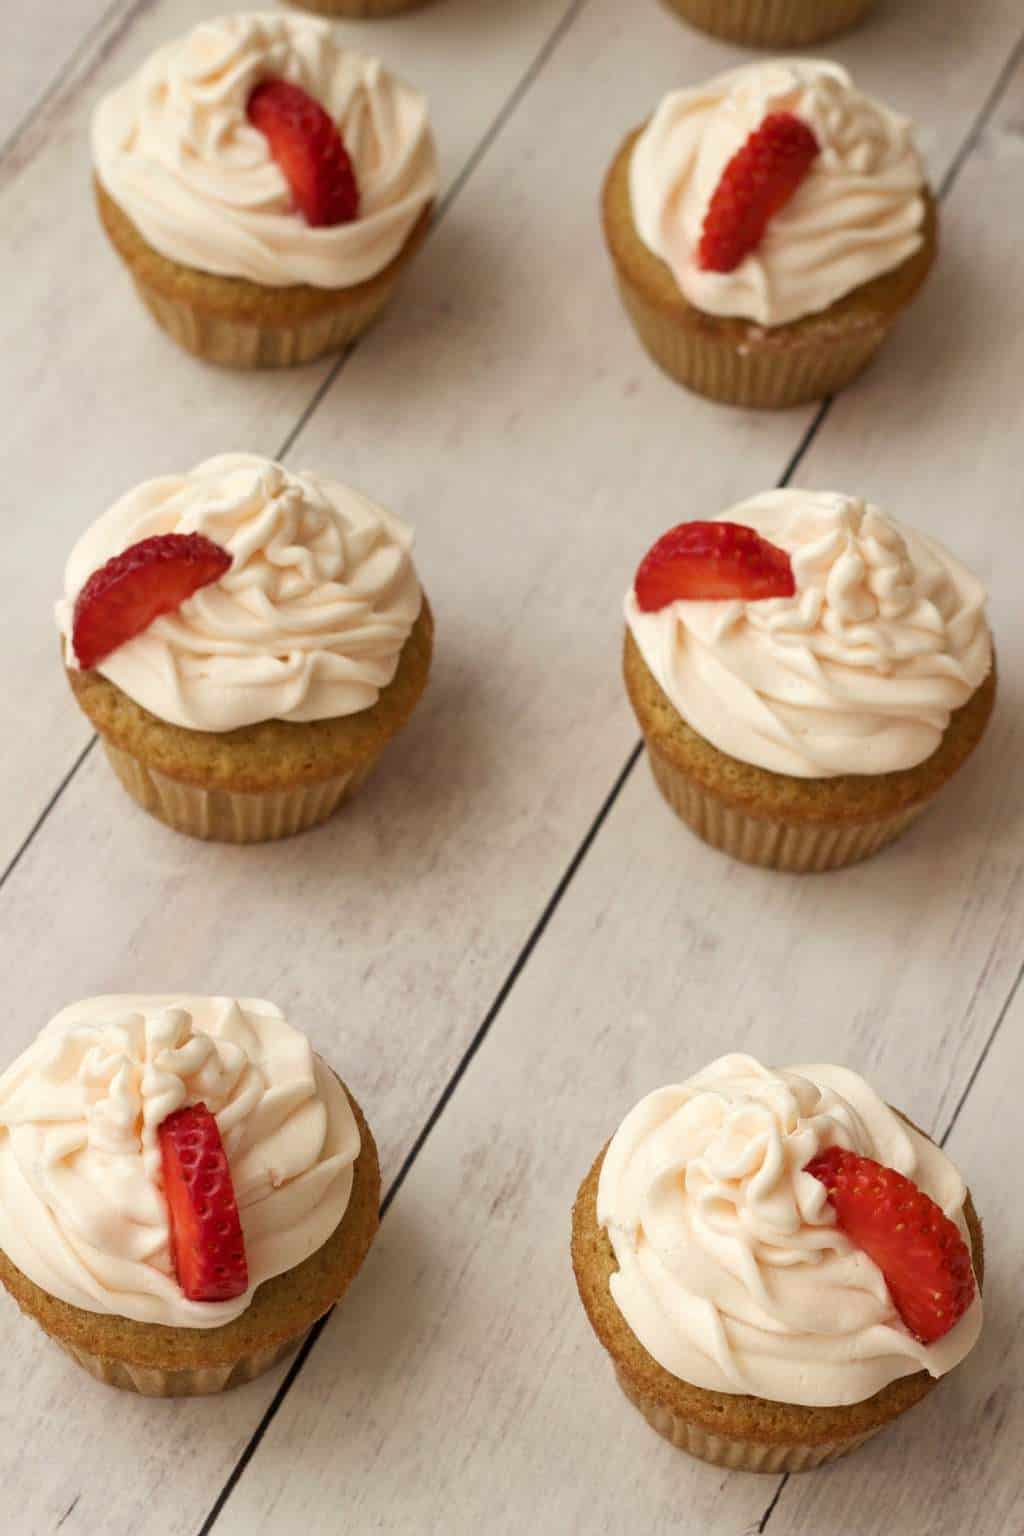 Vegan Vanilla Cupcakes with Strawberry Vanilla Frosting #vegan #lovingitvegan #vanilla #cupcakes #dessert #cakes